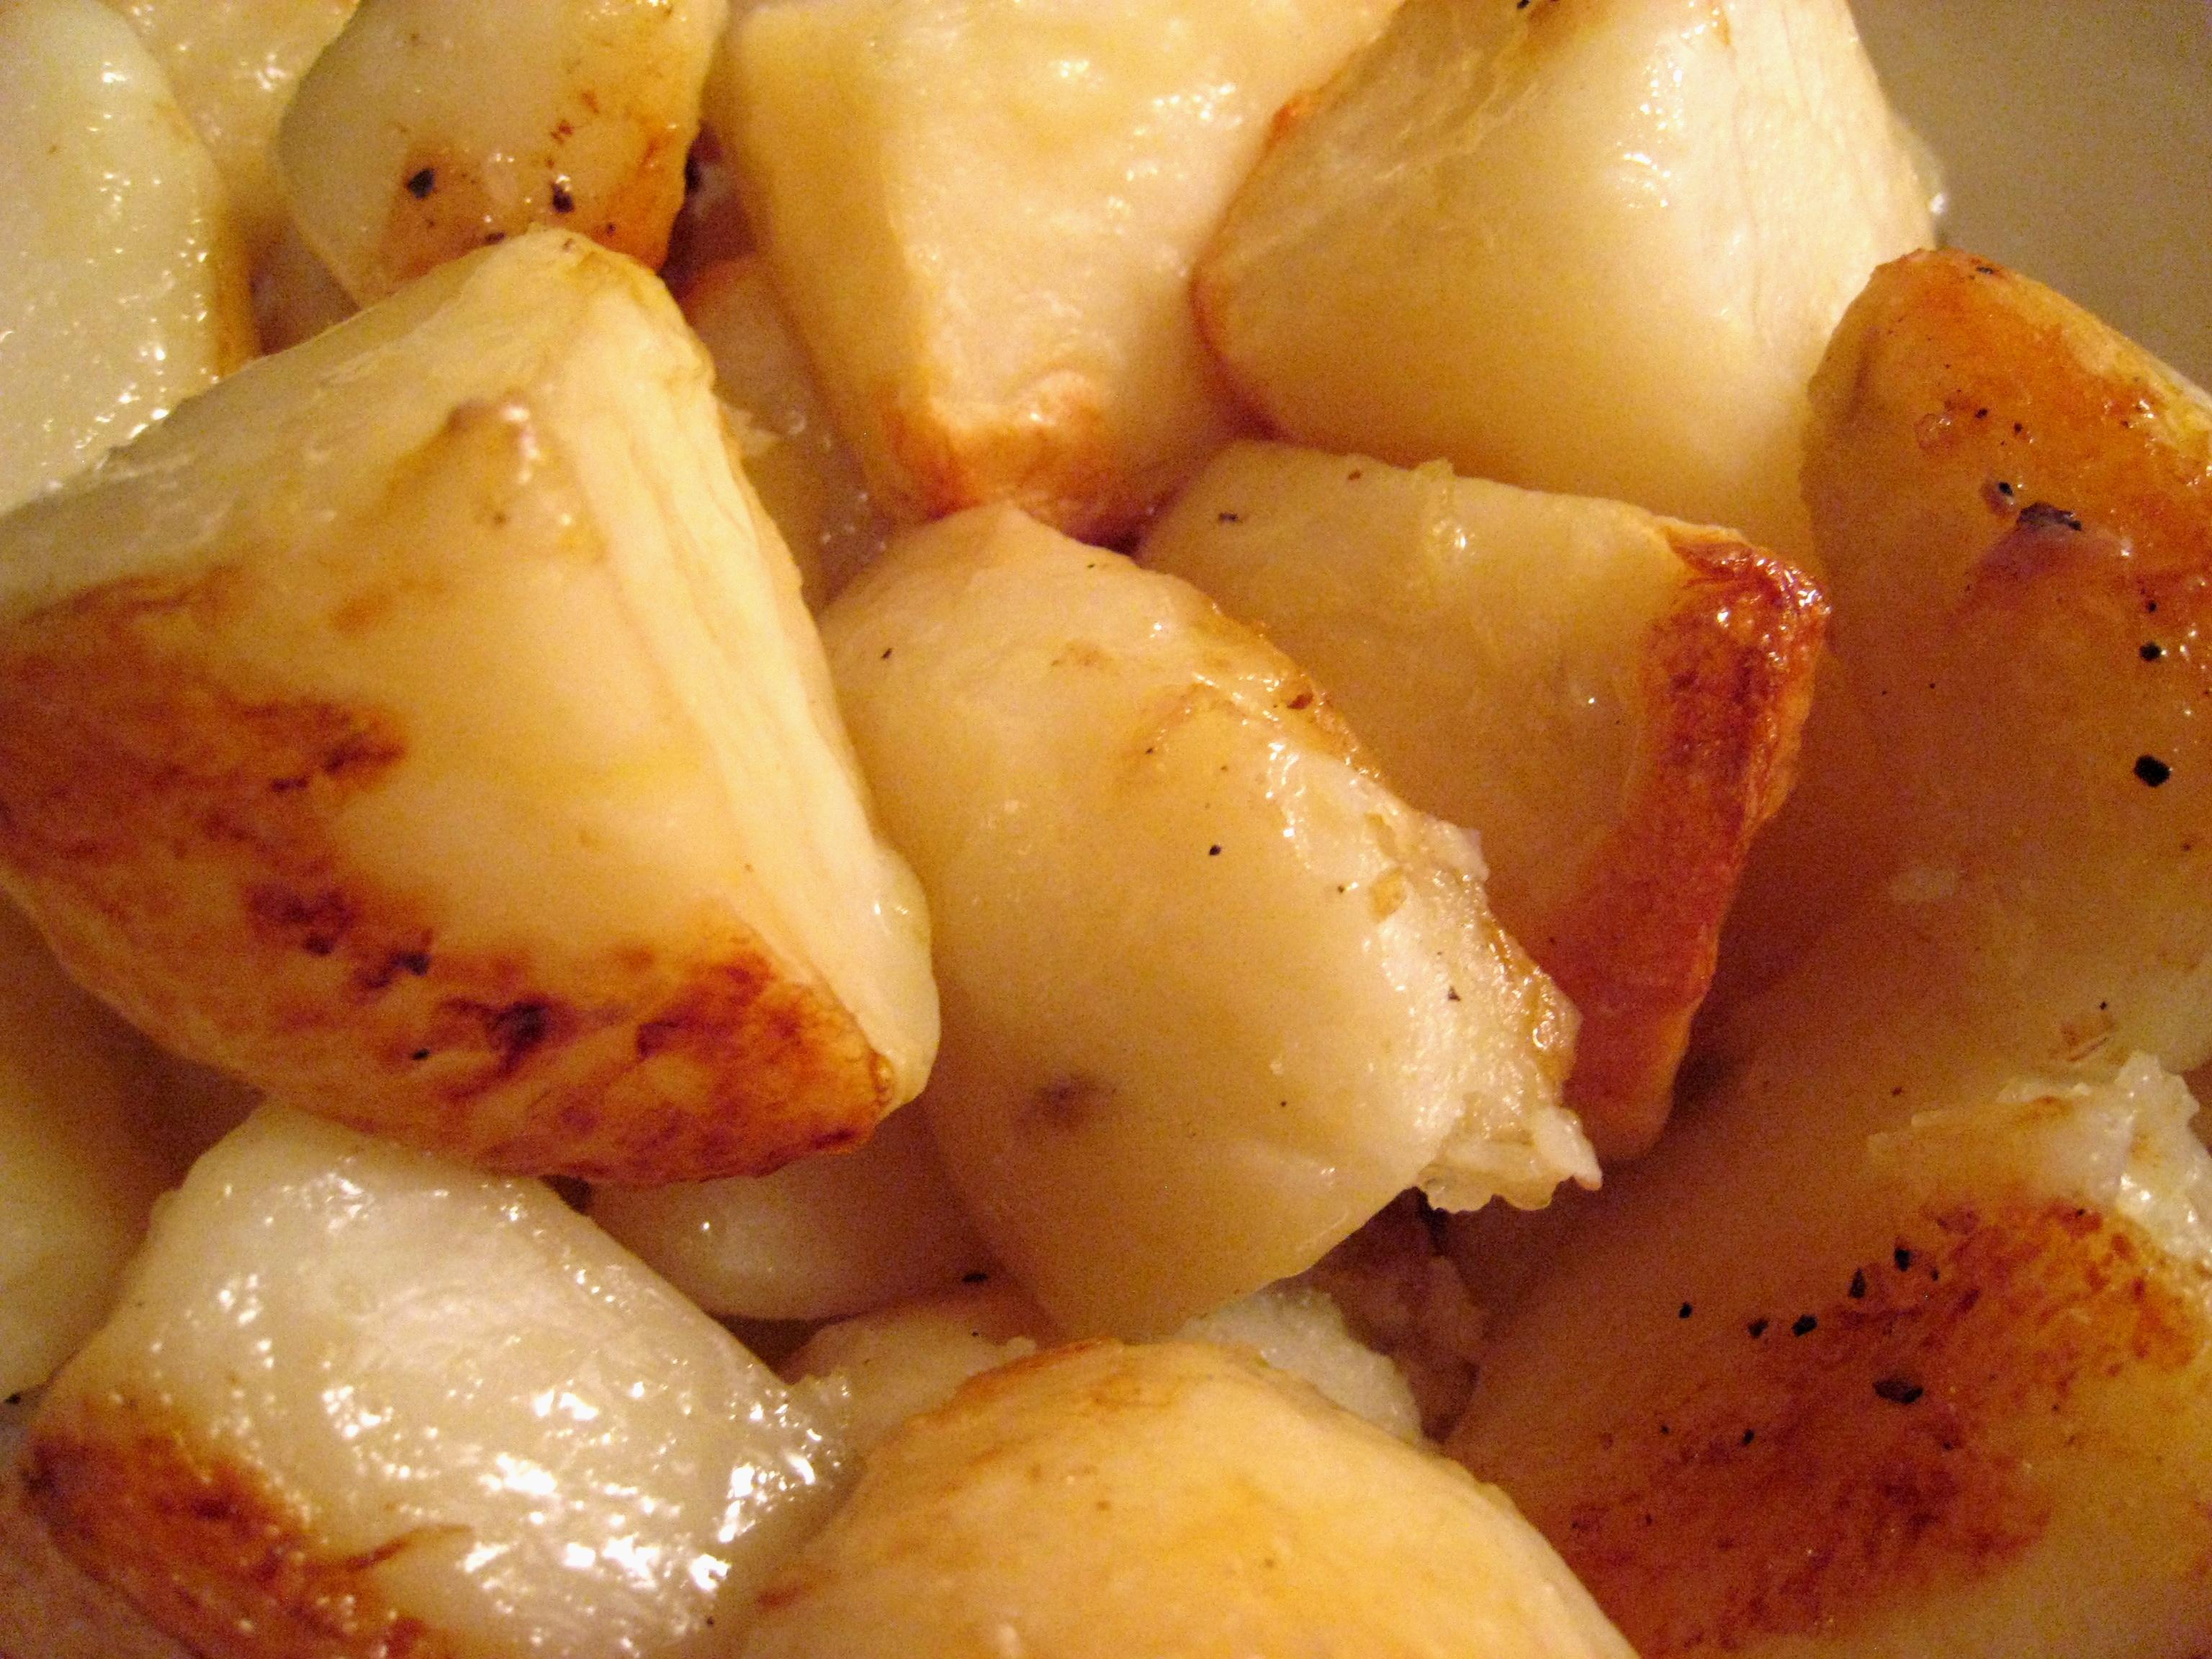 Gwyneth Paltrow Pantry British Style Roast Potatoes For Roast Chicken Dinner